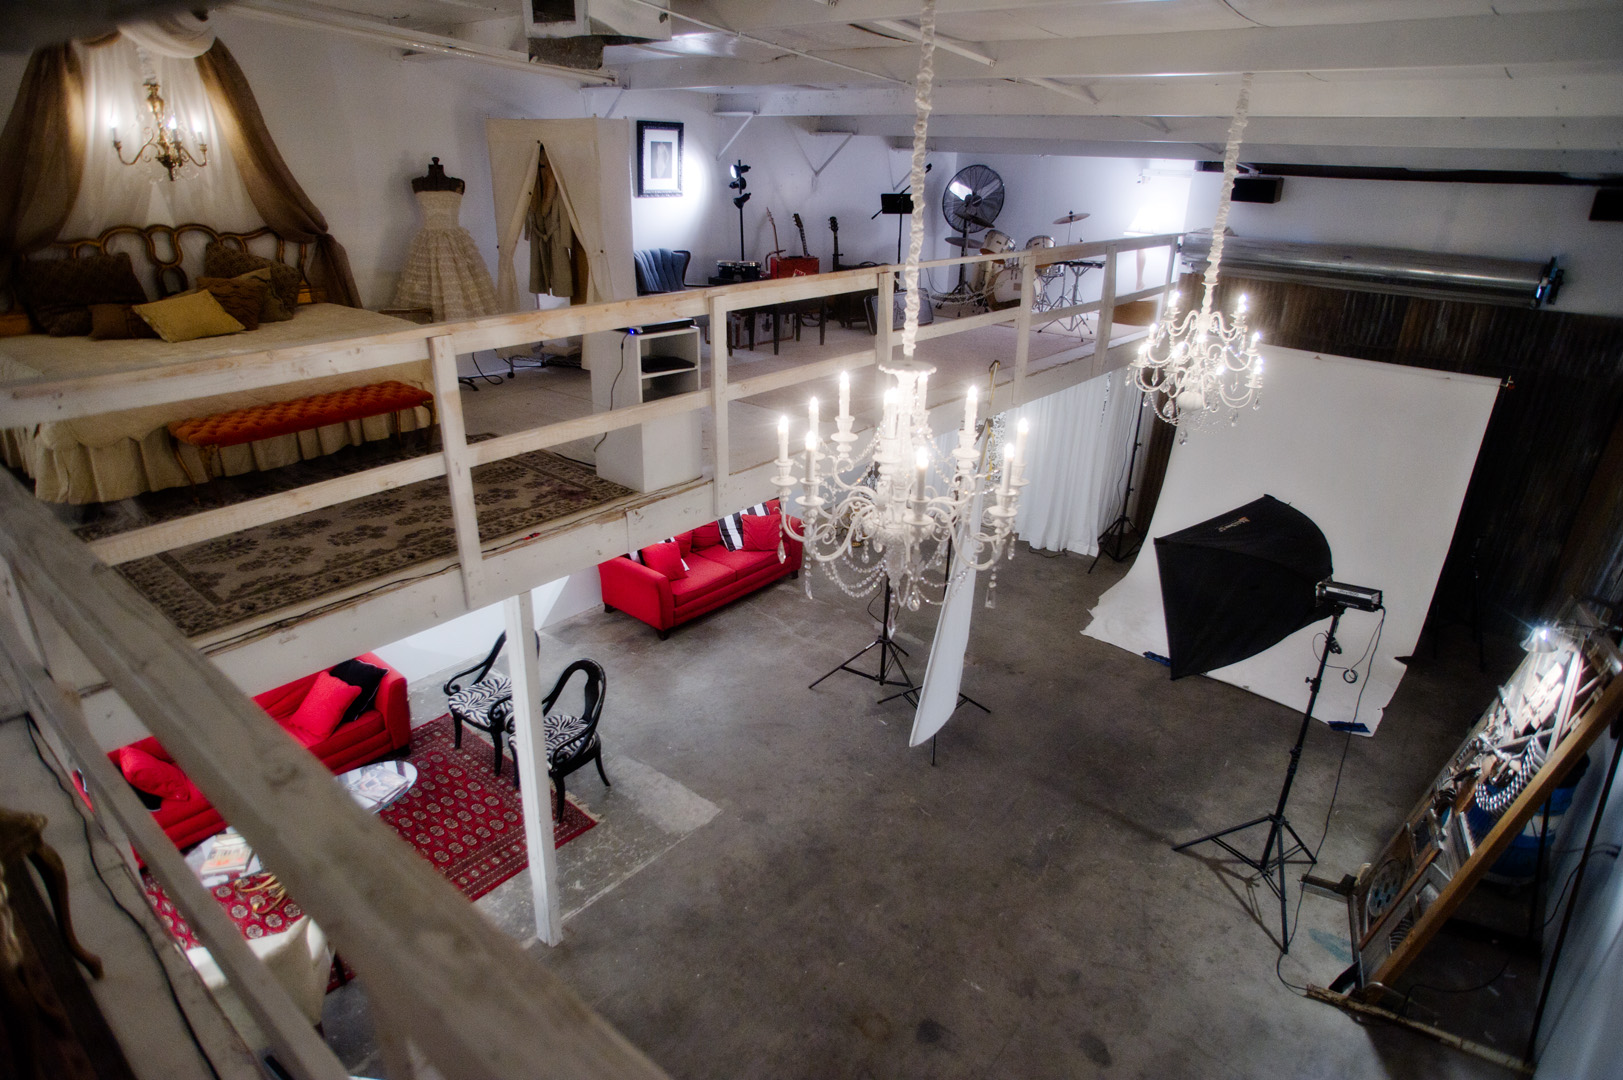 Studio space at Nick Adams Photography